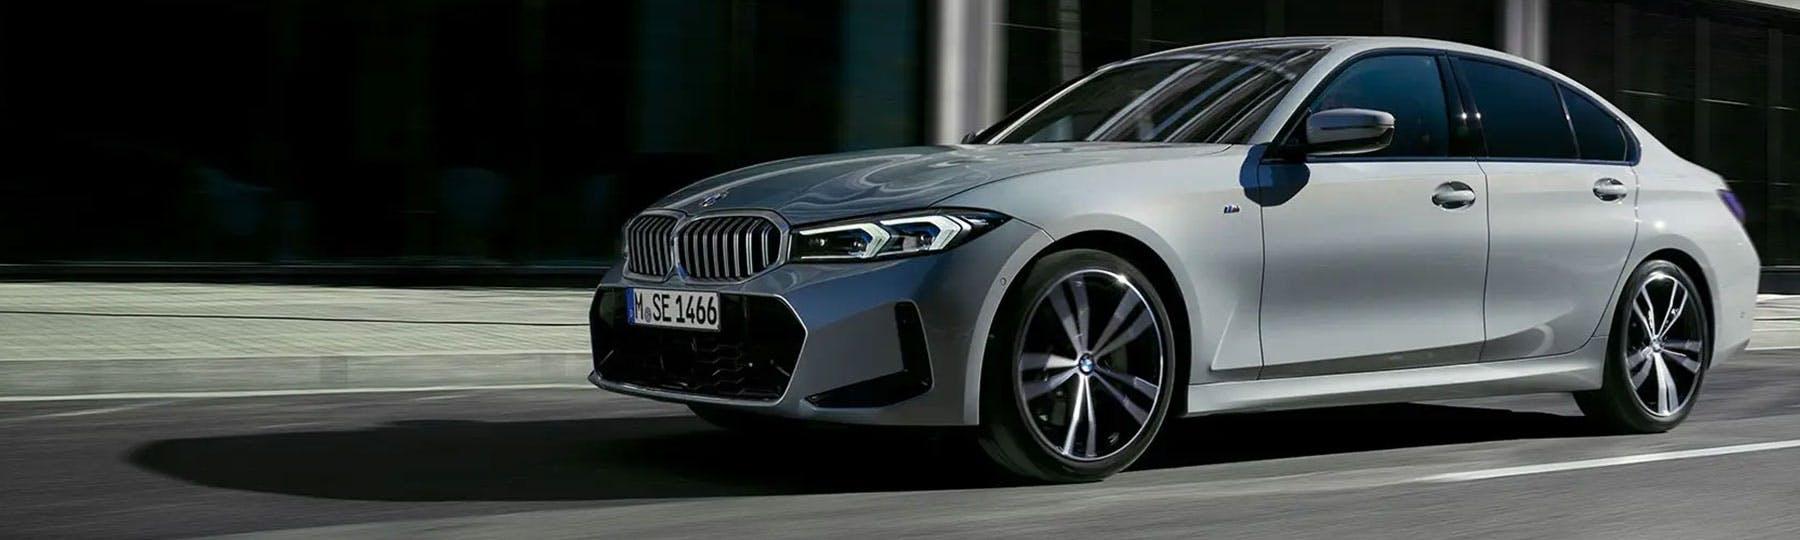 New BMW 3 Series Saloon